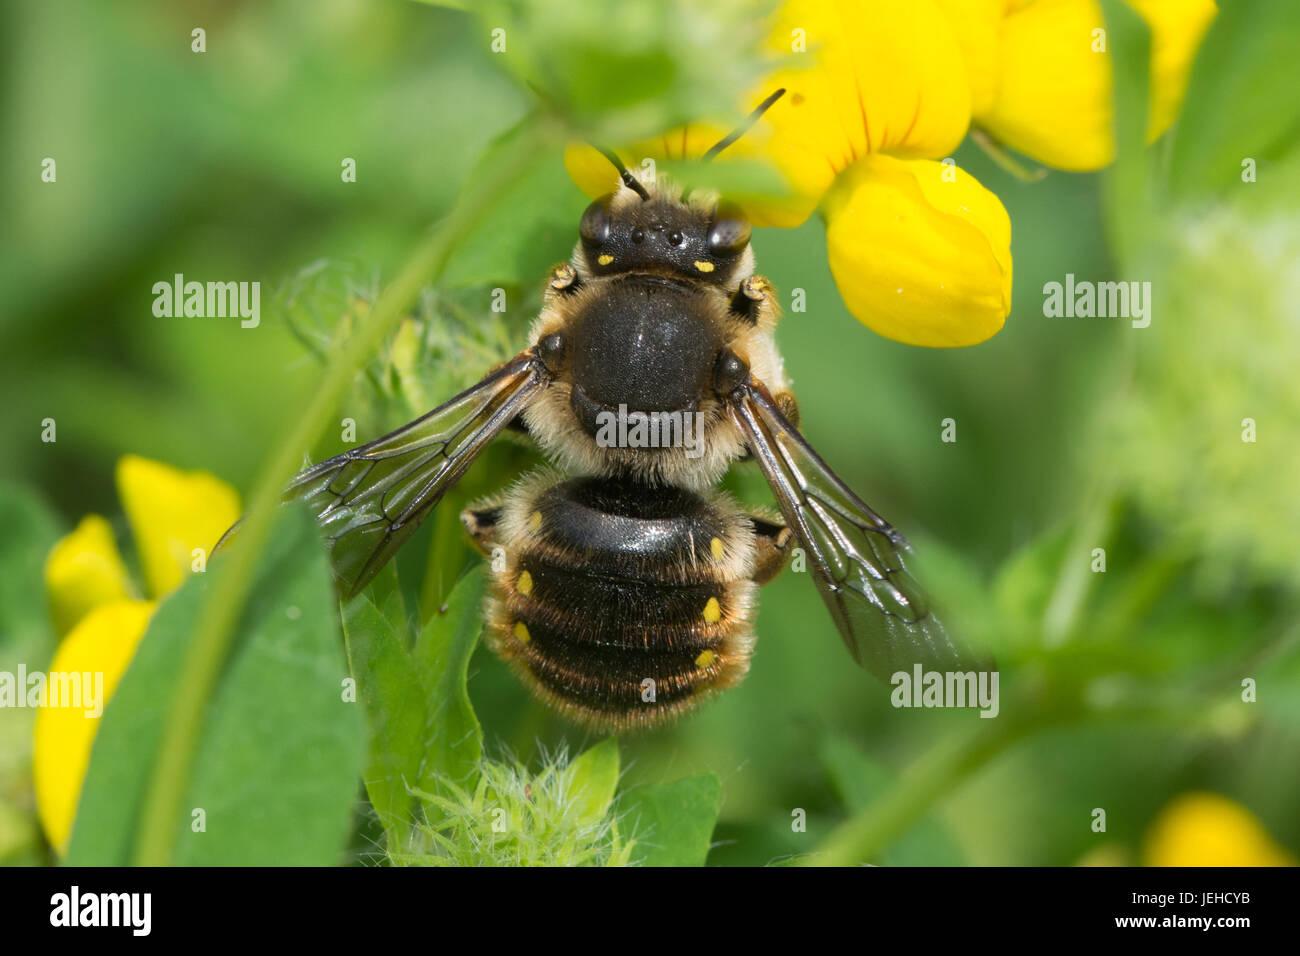 Close-up of a wool-carder bee (Anthidium manicatum) - Stock Image